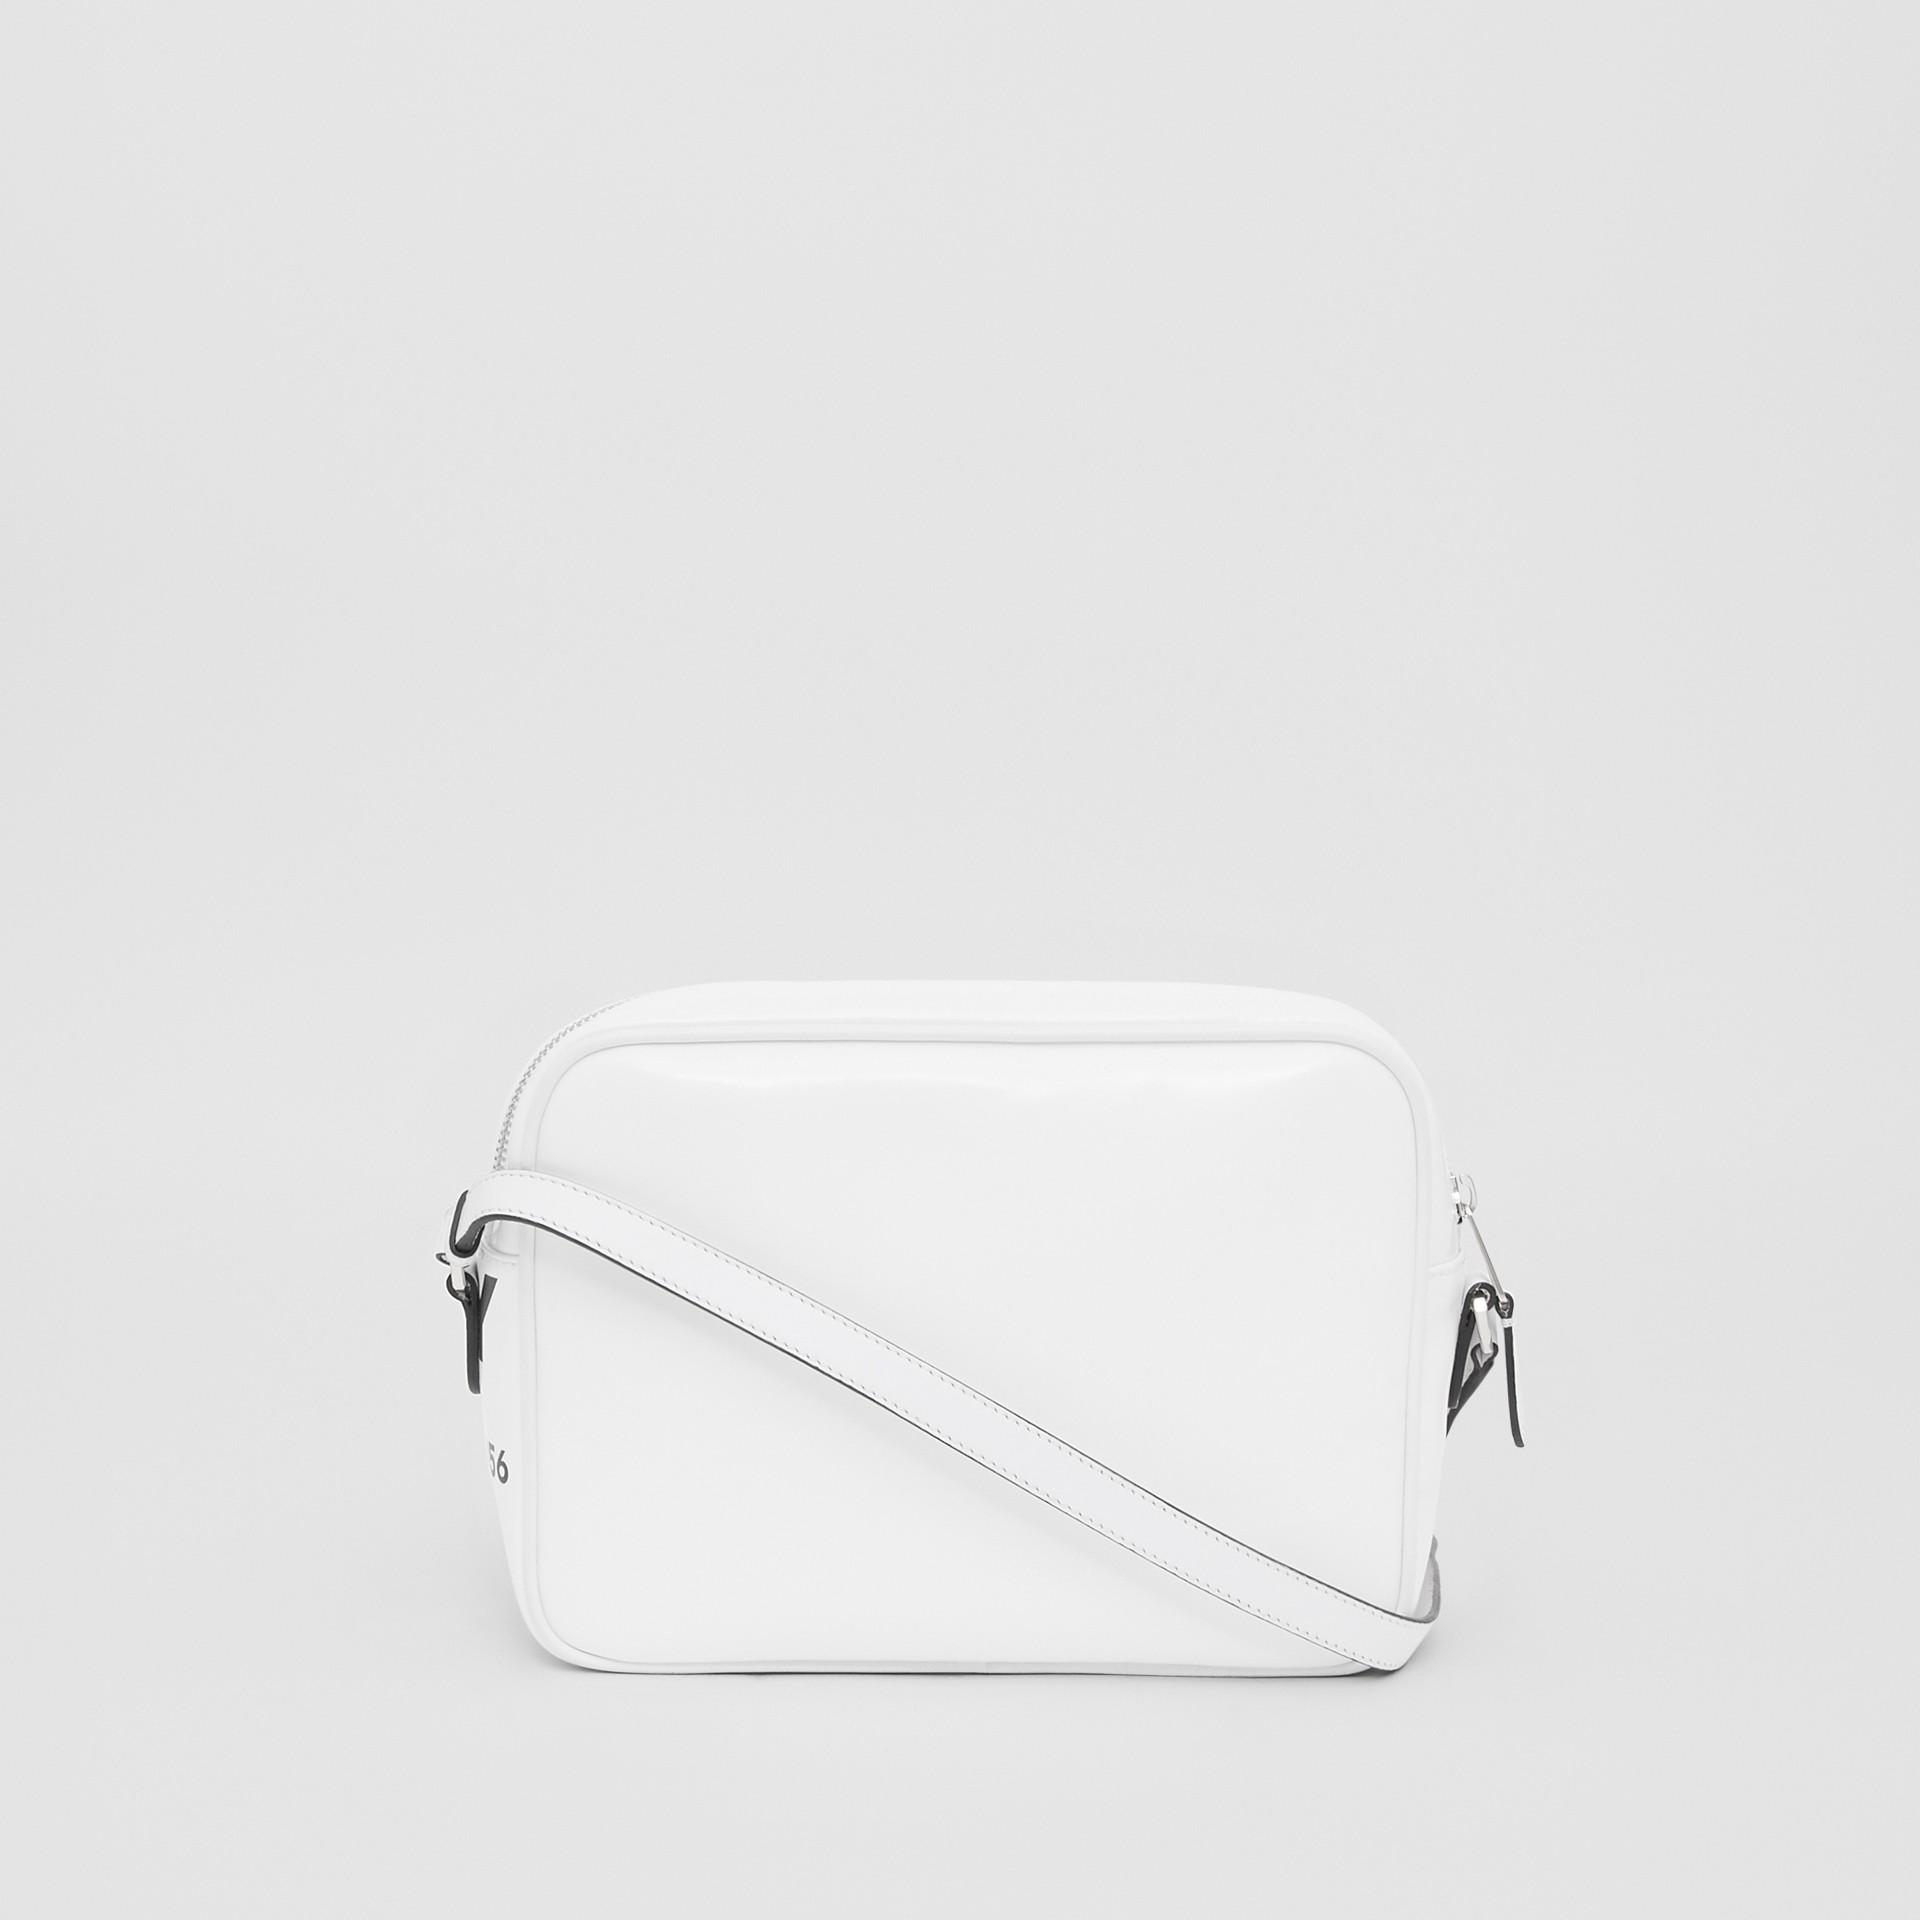 Medium Horseferry Print Camera Bag in White | Burberry - gallery image 9